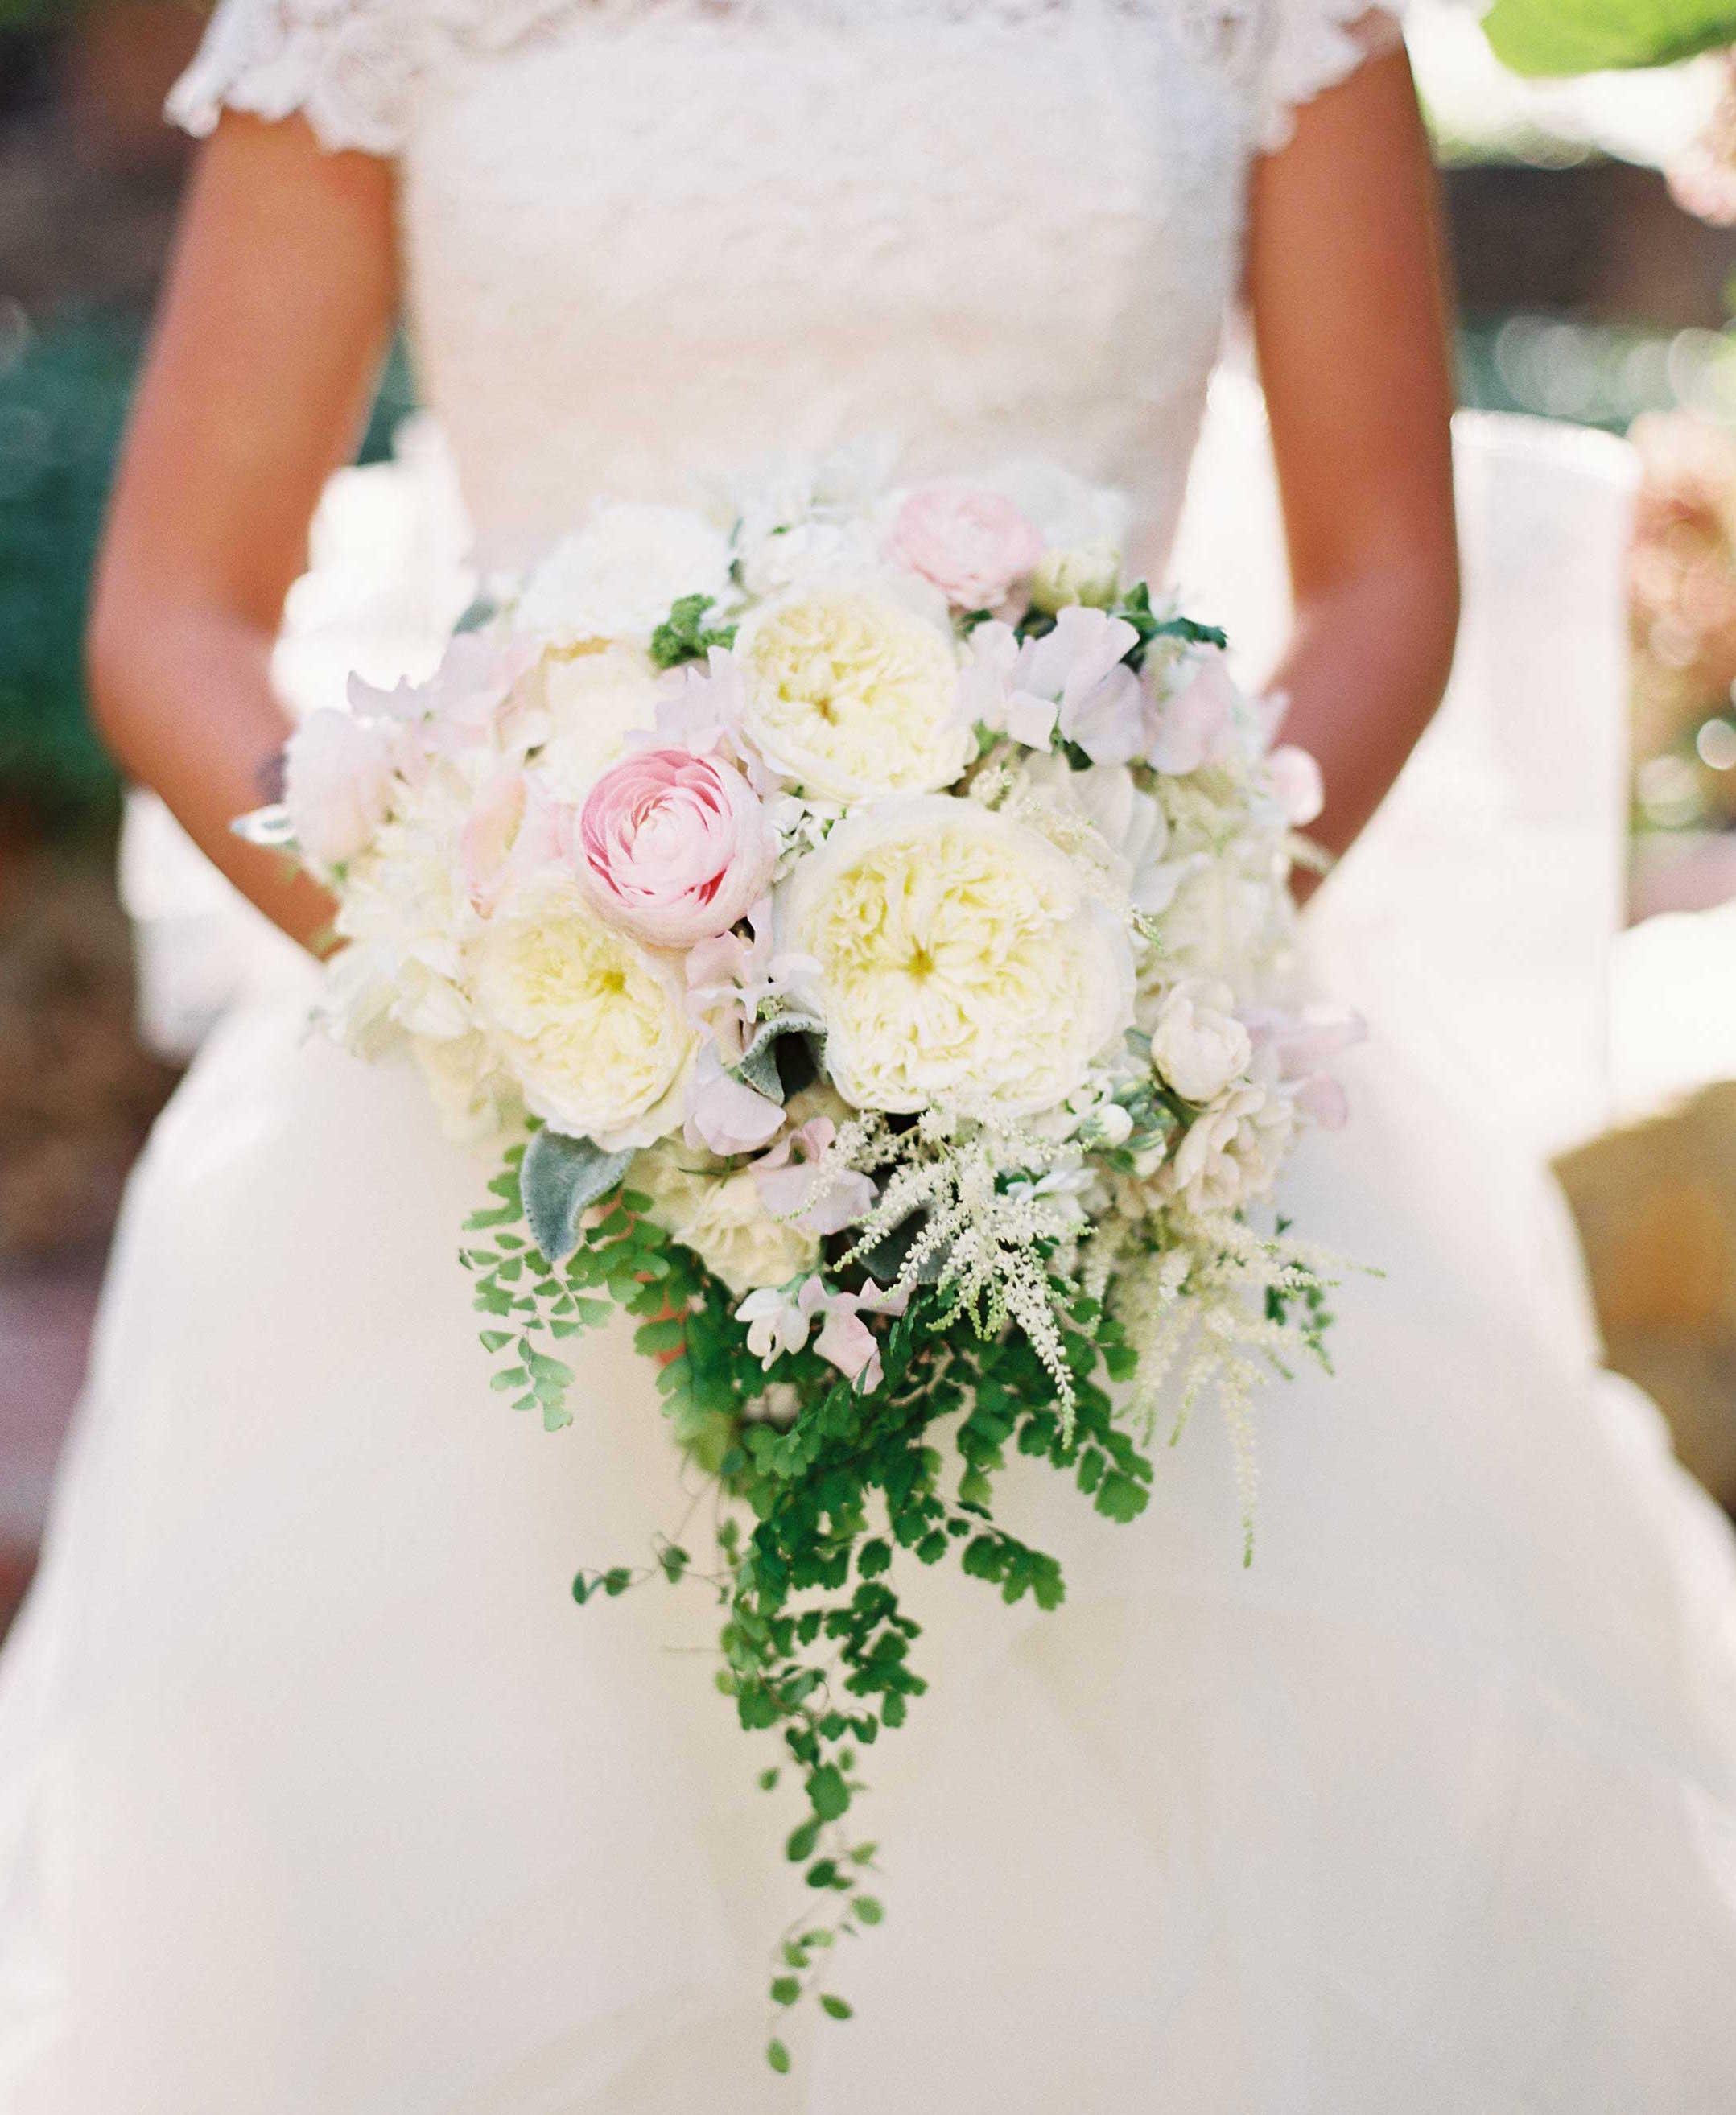 Wedding Flowers: Stylish Pink Bridal Bouquets - Inside Weddings